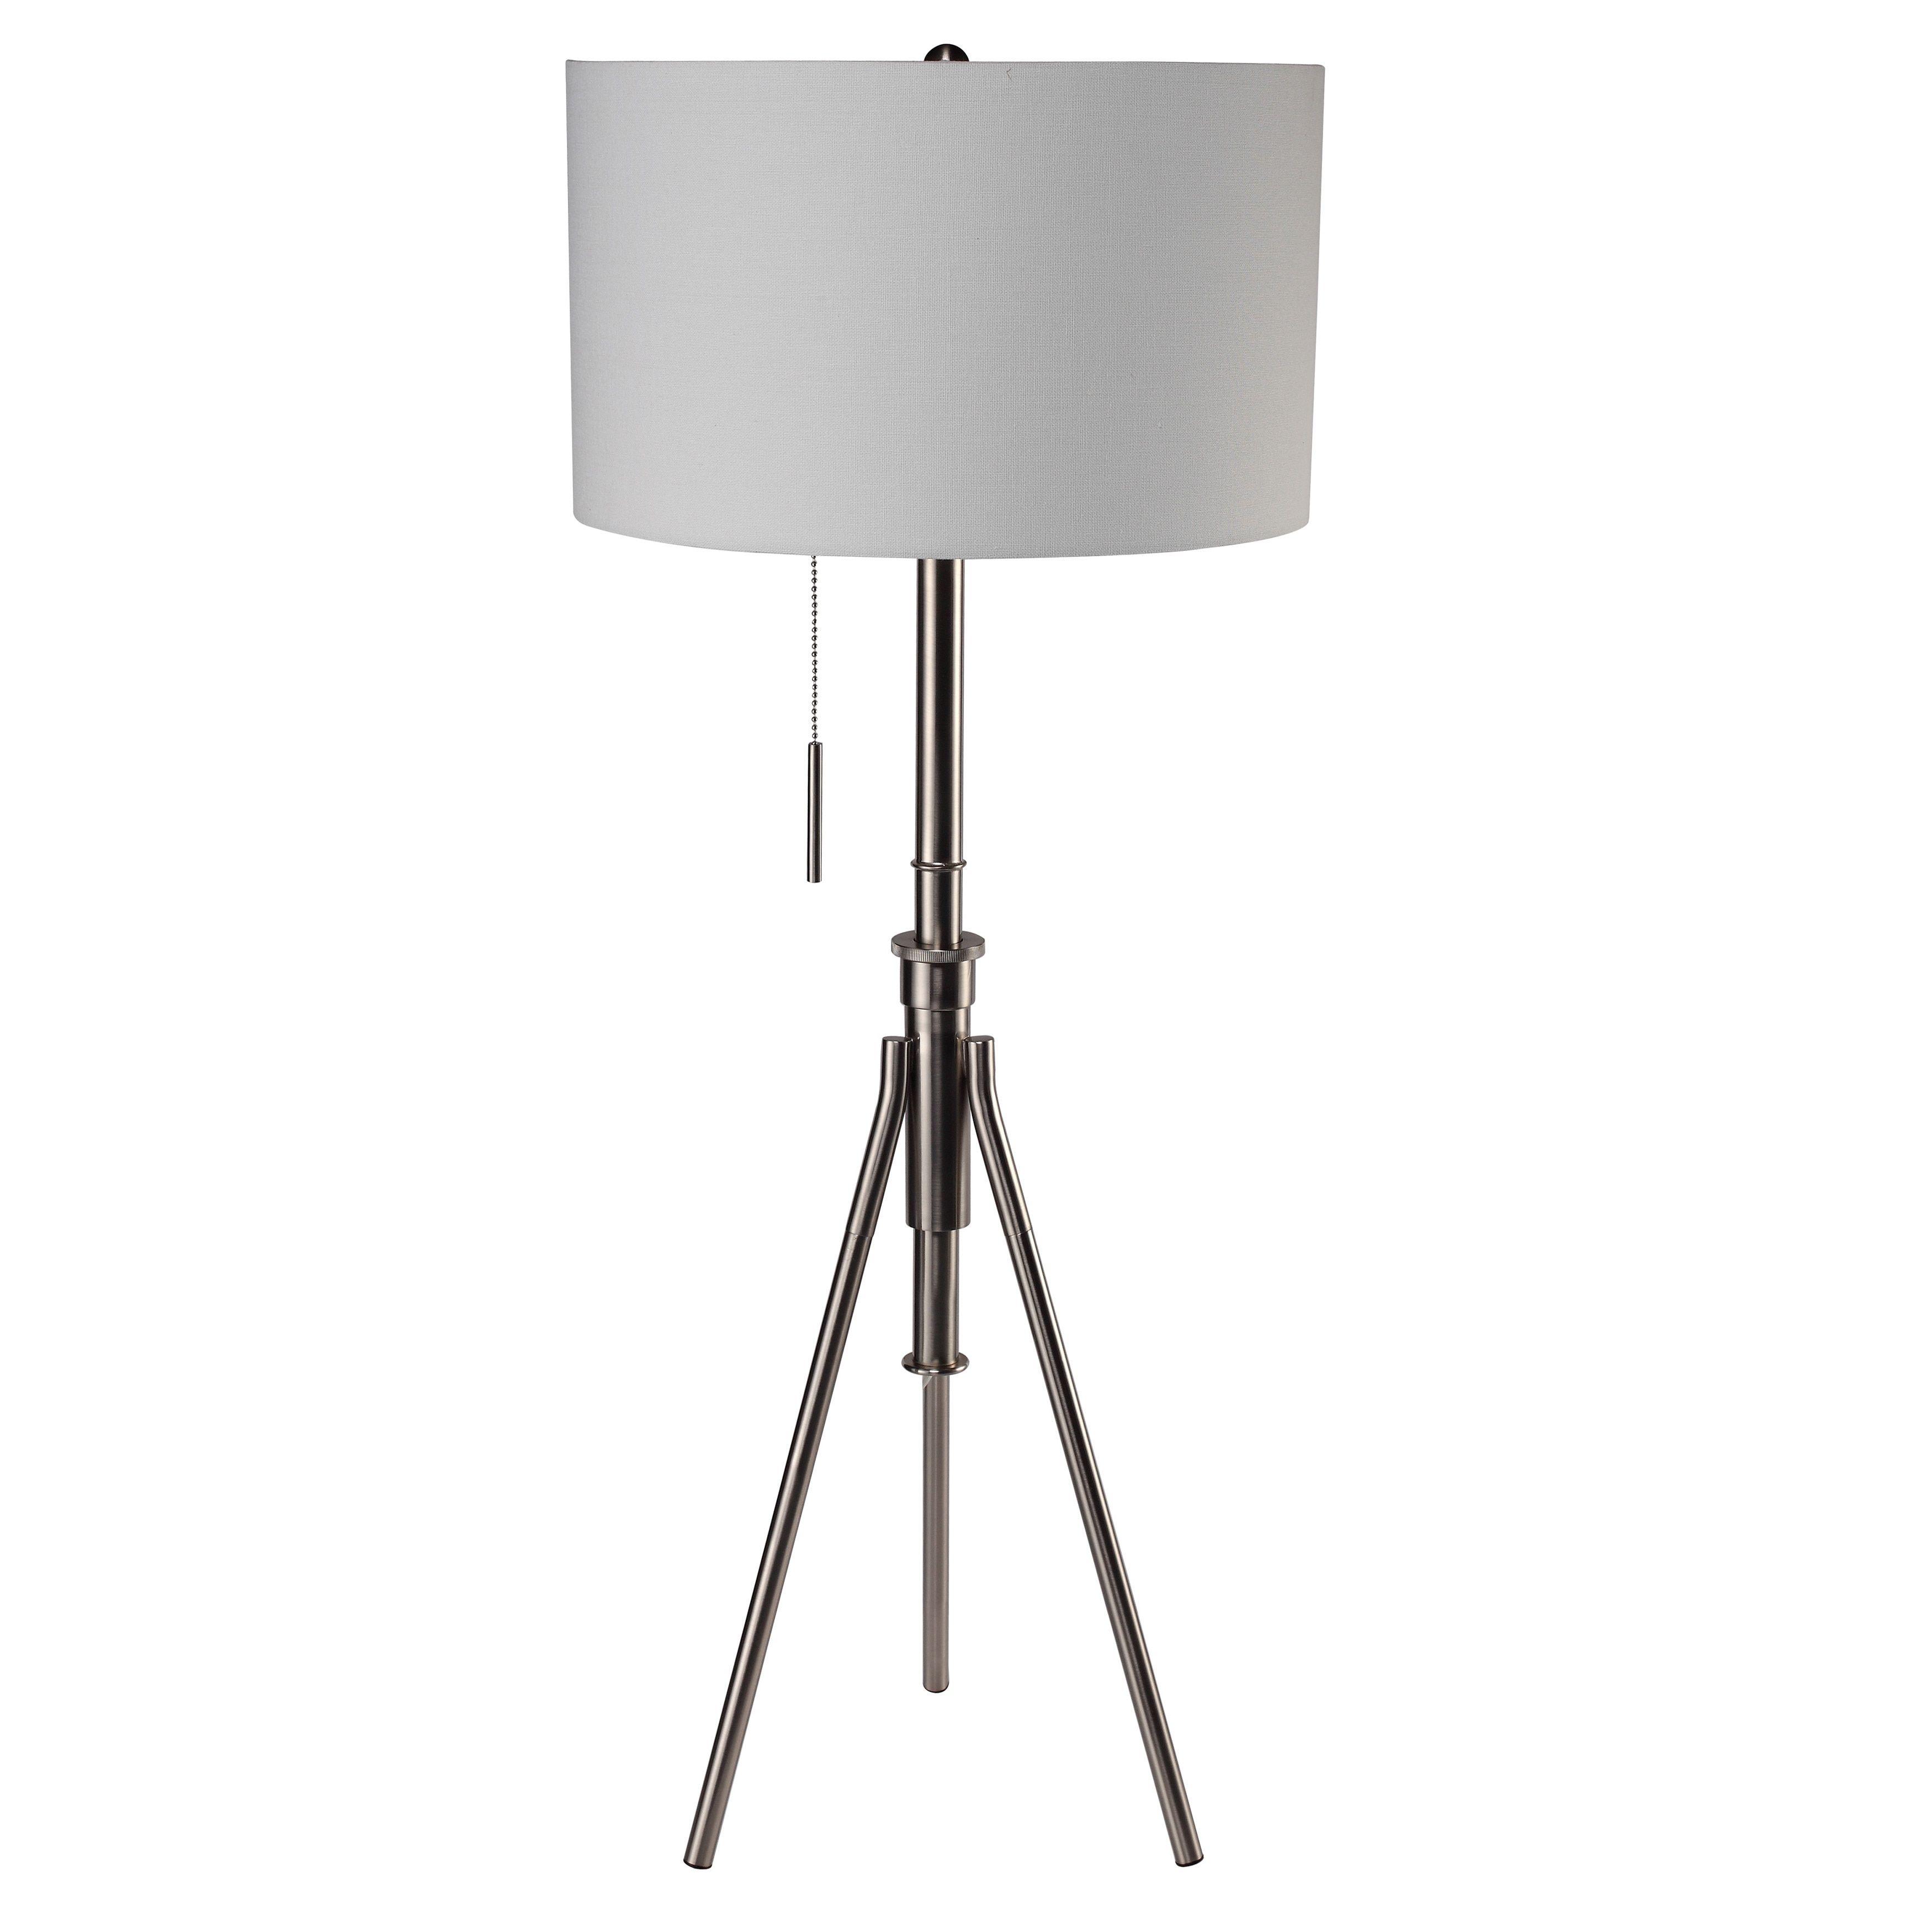 Q-Max Adjustable Brushed Steel Tripod Floor Lamp (Silver) (Fabric)